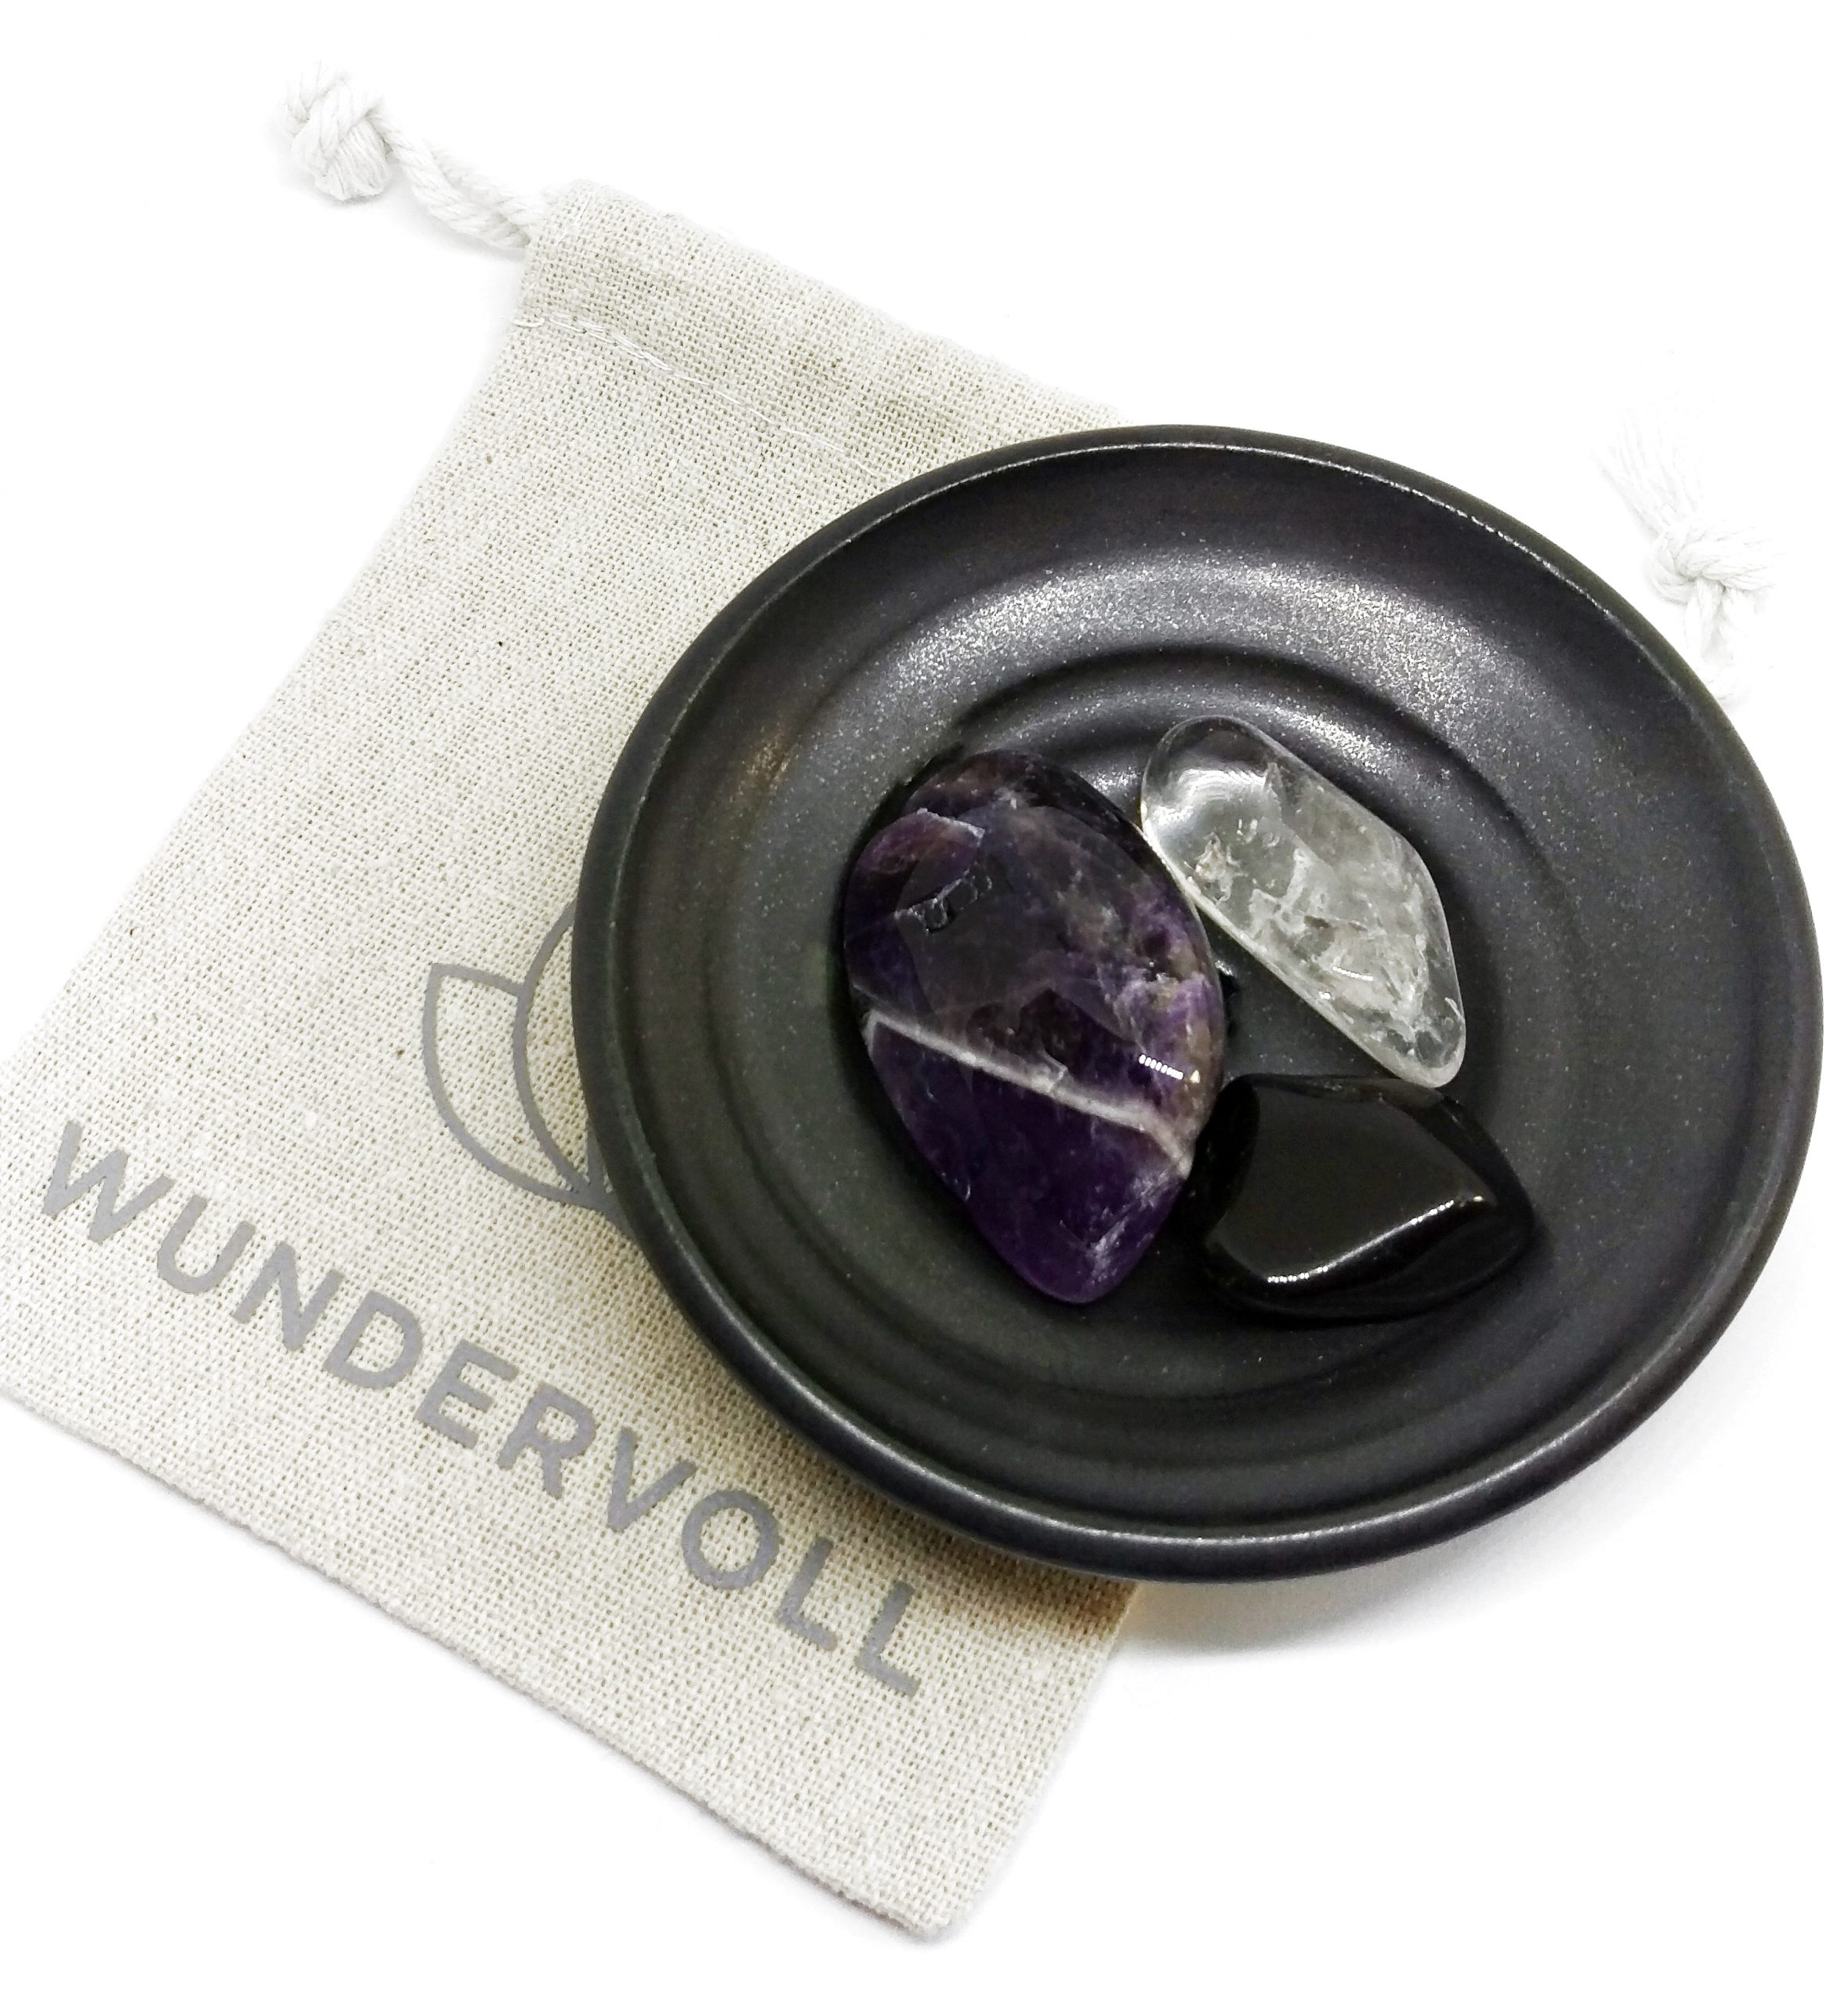 BE Wundervoll Bowl Healingstones Love Light Turmalin Rosenquarz Amethyst Bergkristall Keramik handmade